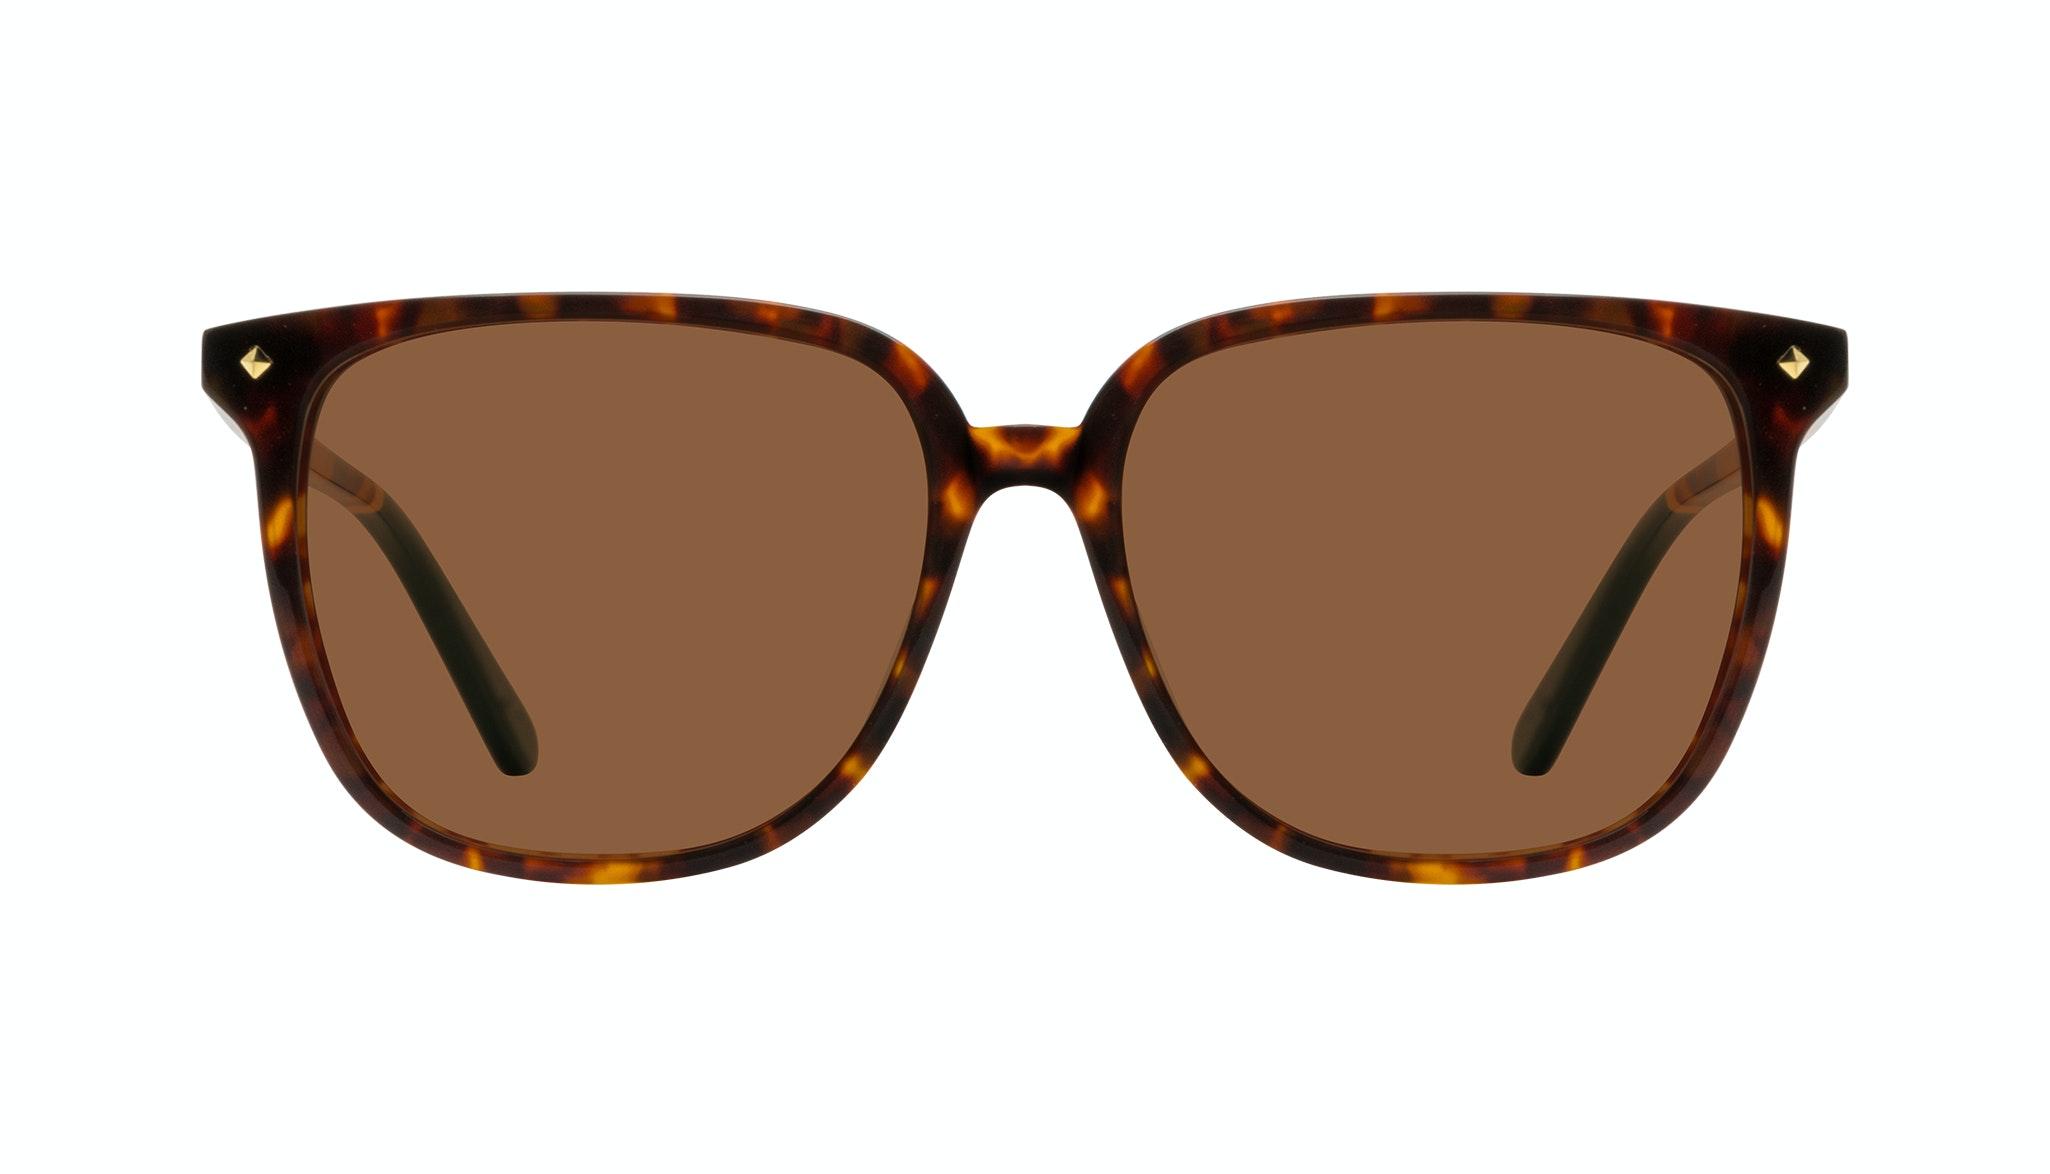 Affordable Fashion Glasses Cat Eye Sunglasses Women Gia Tortoise